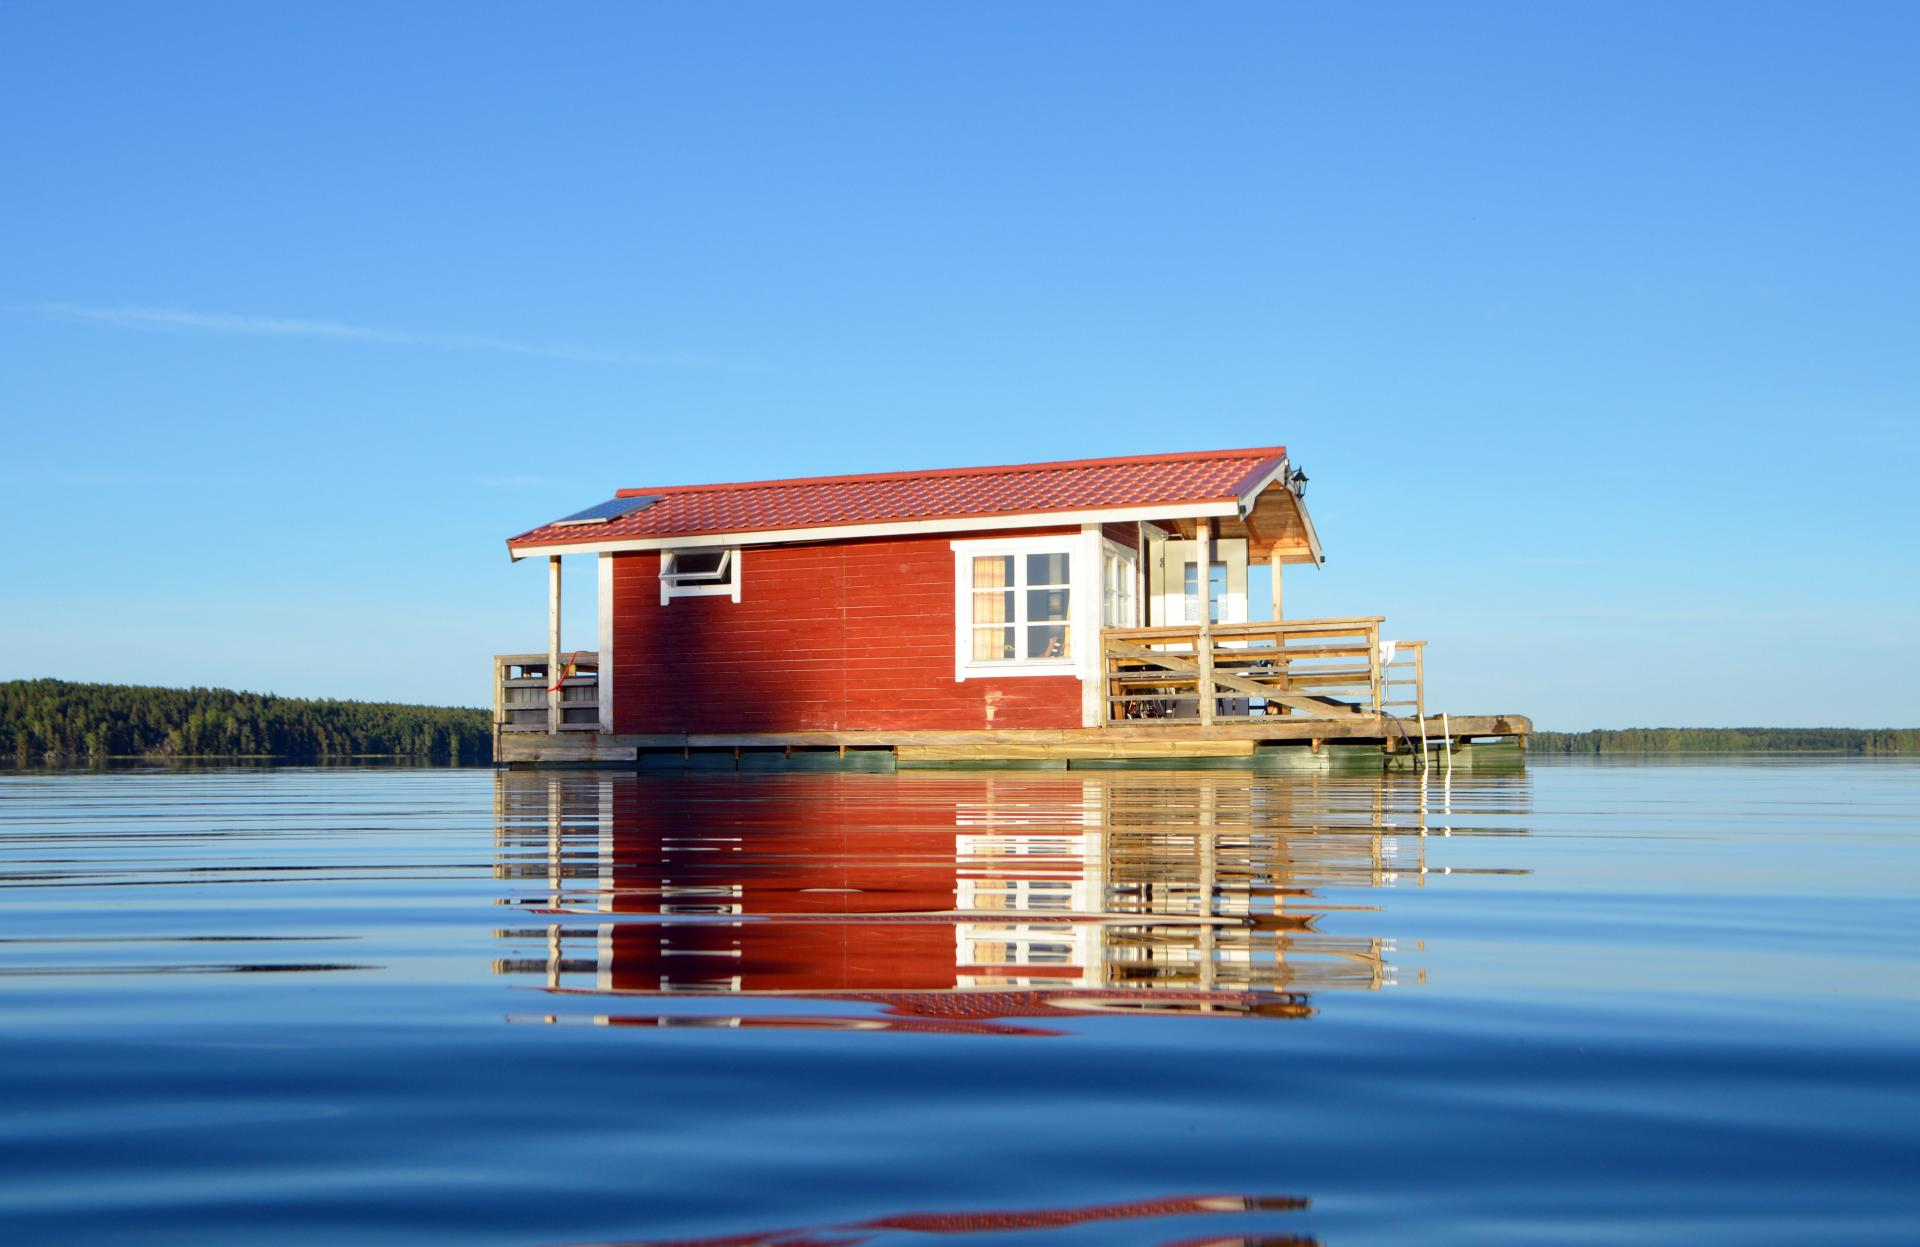 Sormland Sweden Travel Guide Explore Stockholm Archipelago Islands